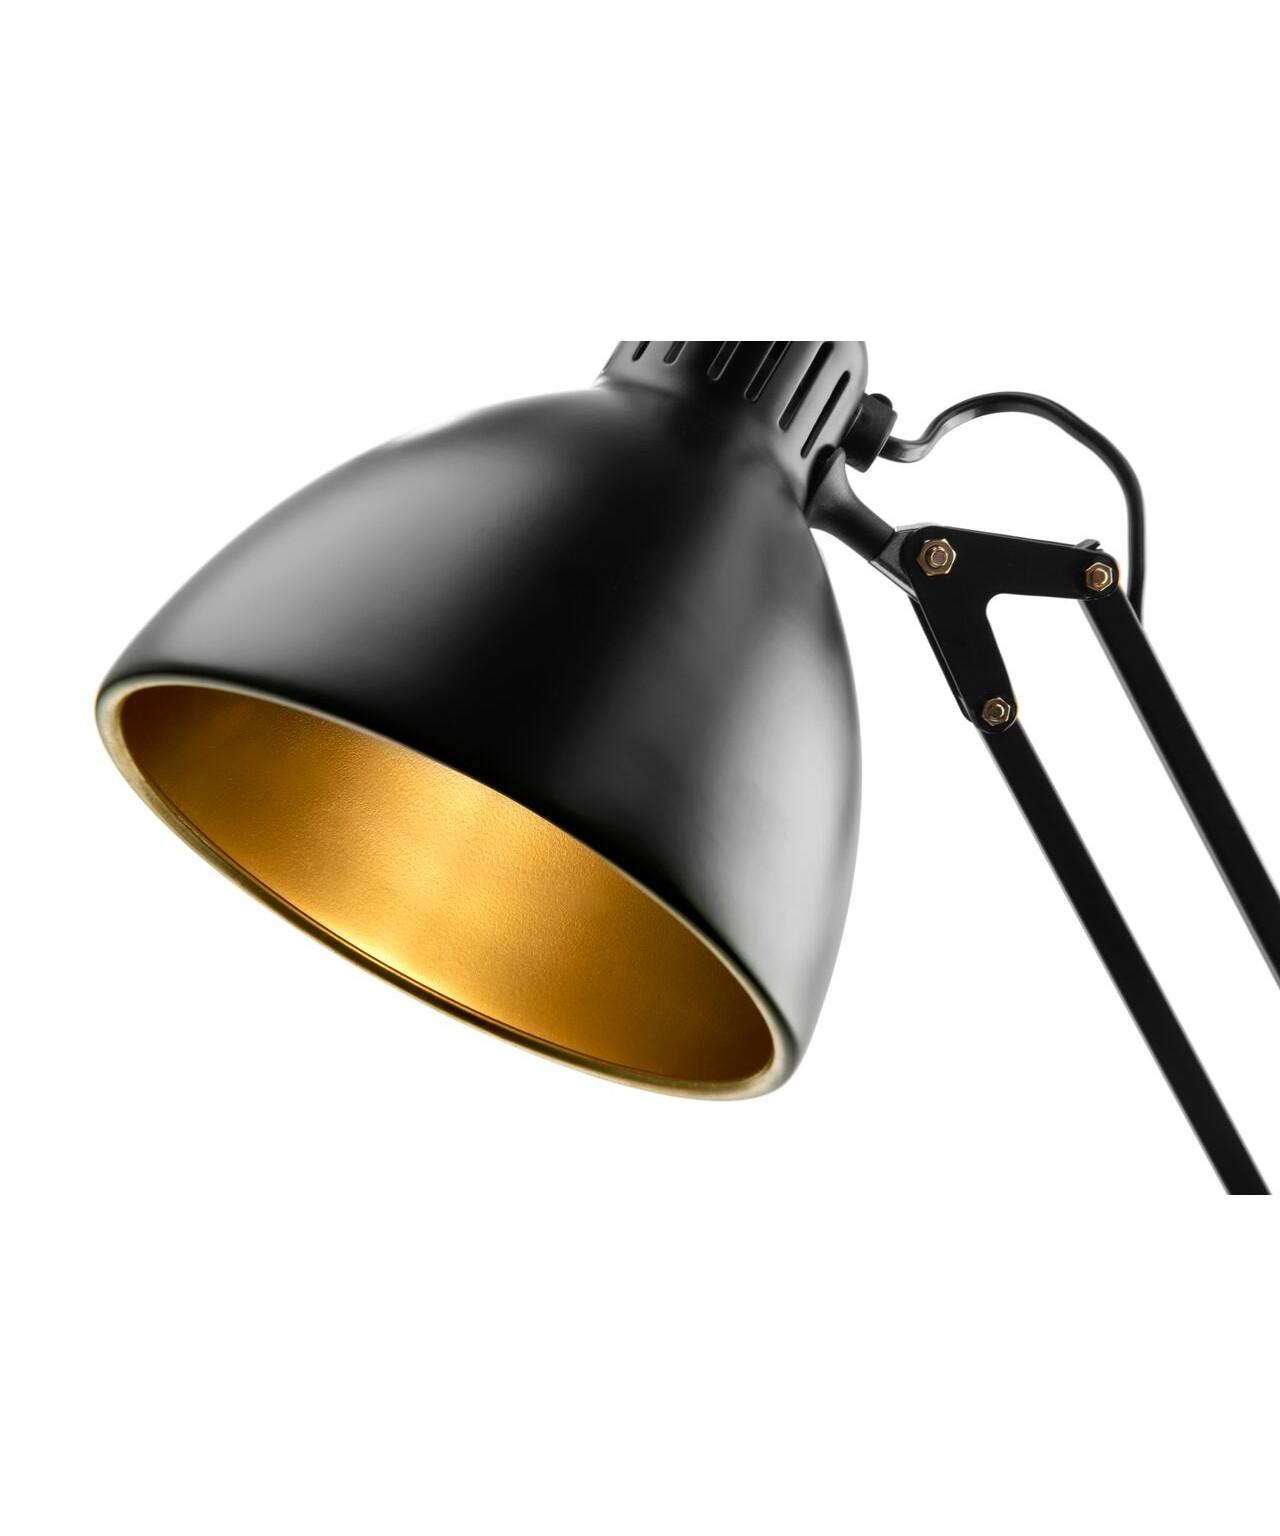 archi w2 wandleuchte schwarz gold light point. Black Bedroom Furniture Sets. Home Design Ideas